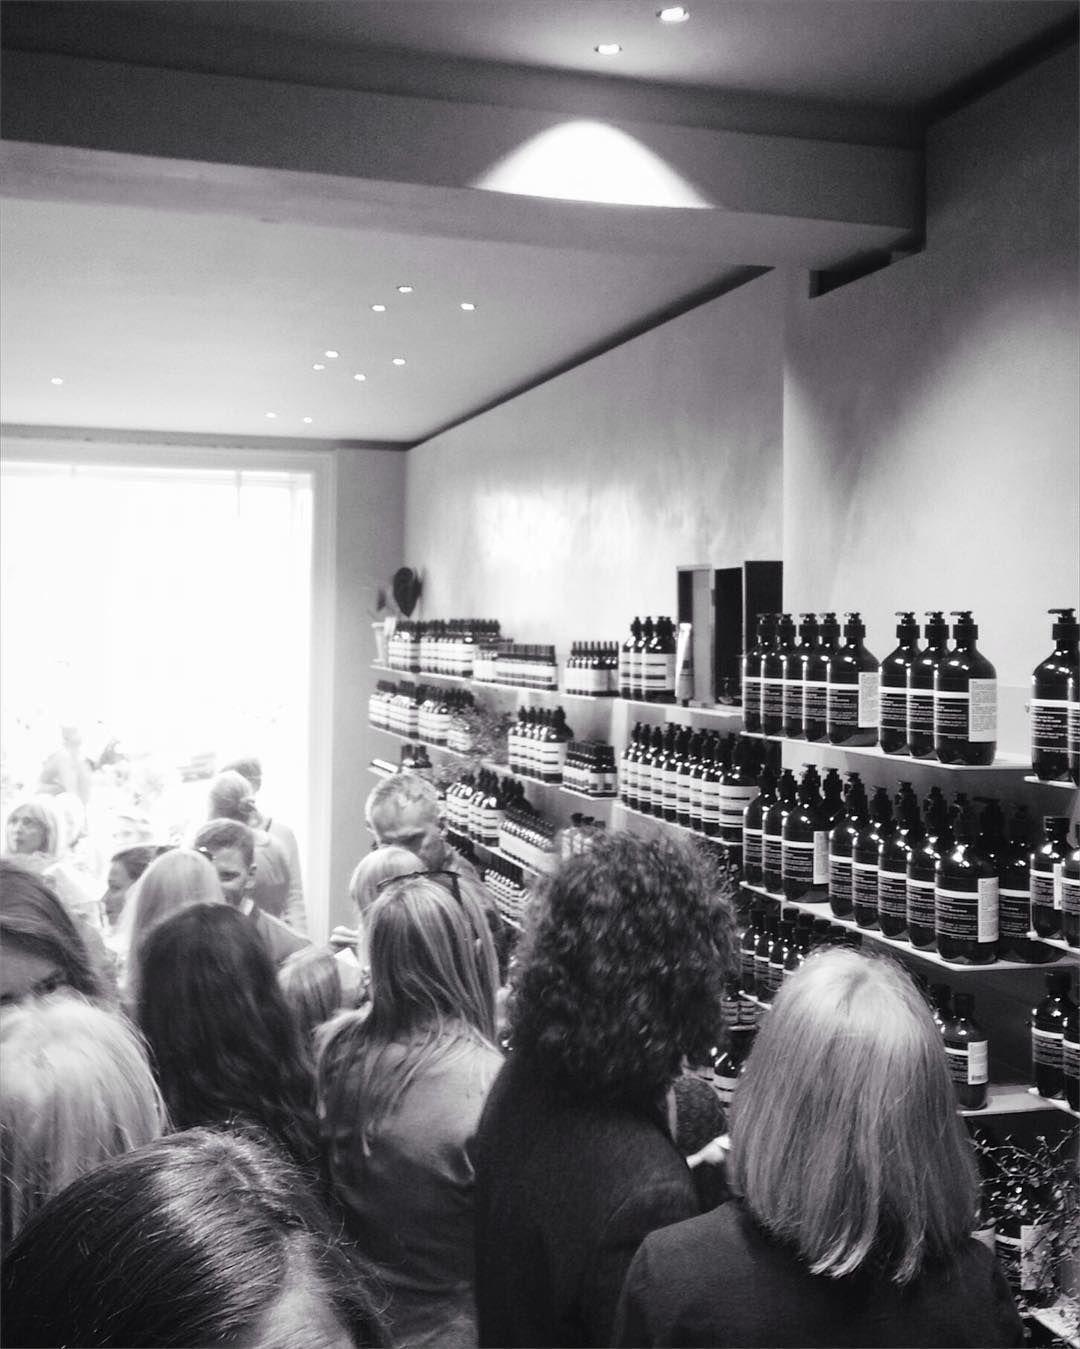 Aēsop velkomme til København  #aesop #skincare #shopping #openingday #københavn #denmark #danmark #interiordesign #vesterbro #stylist #productdesign #fabulous #swagger by samsandvighosman